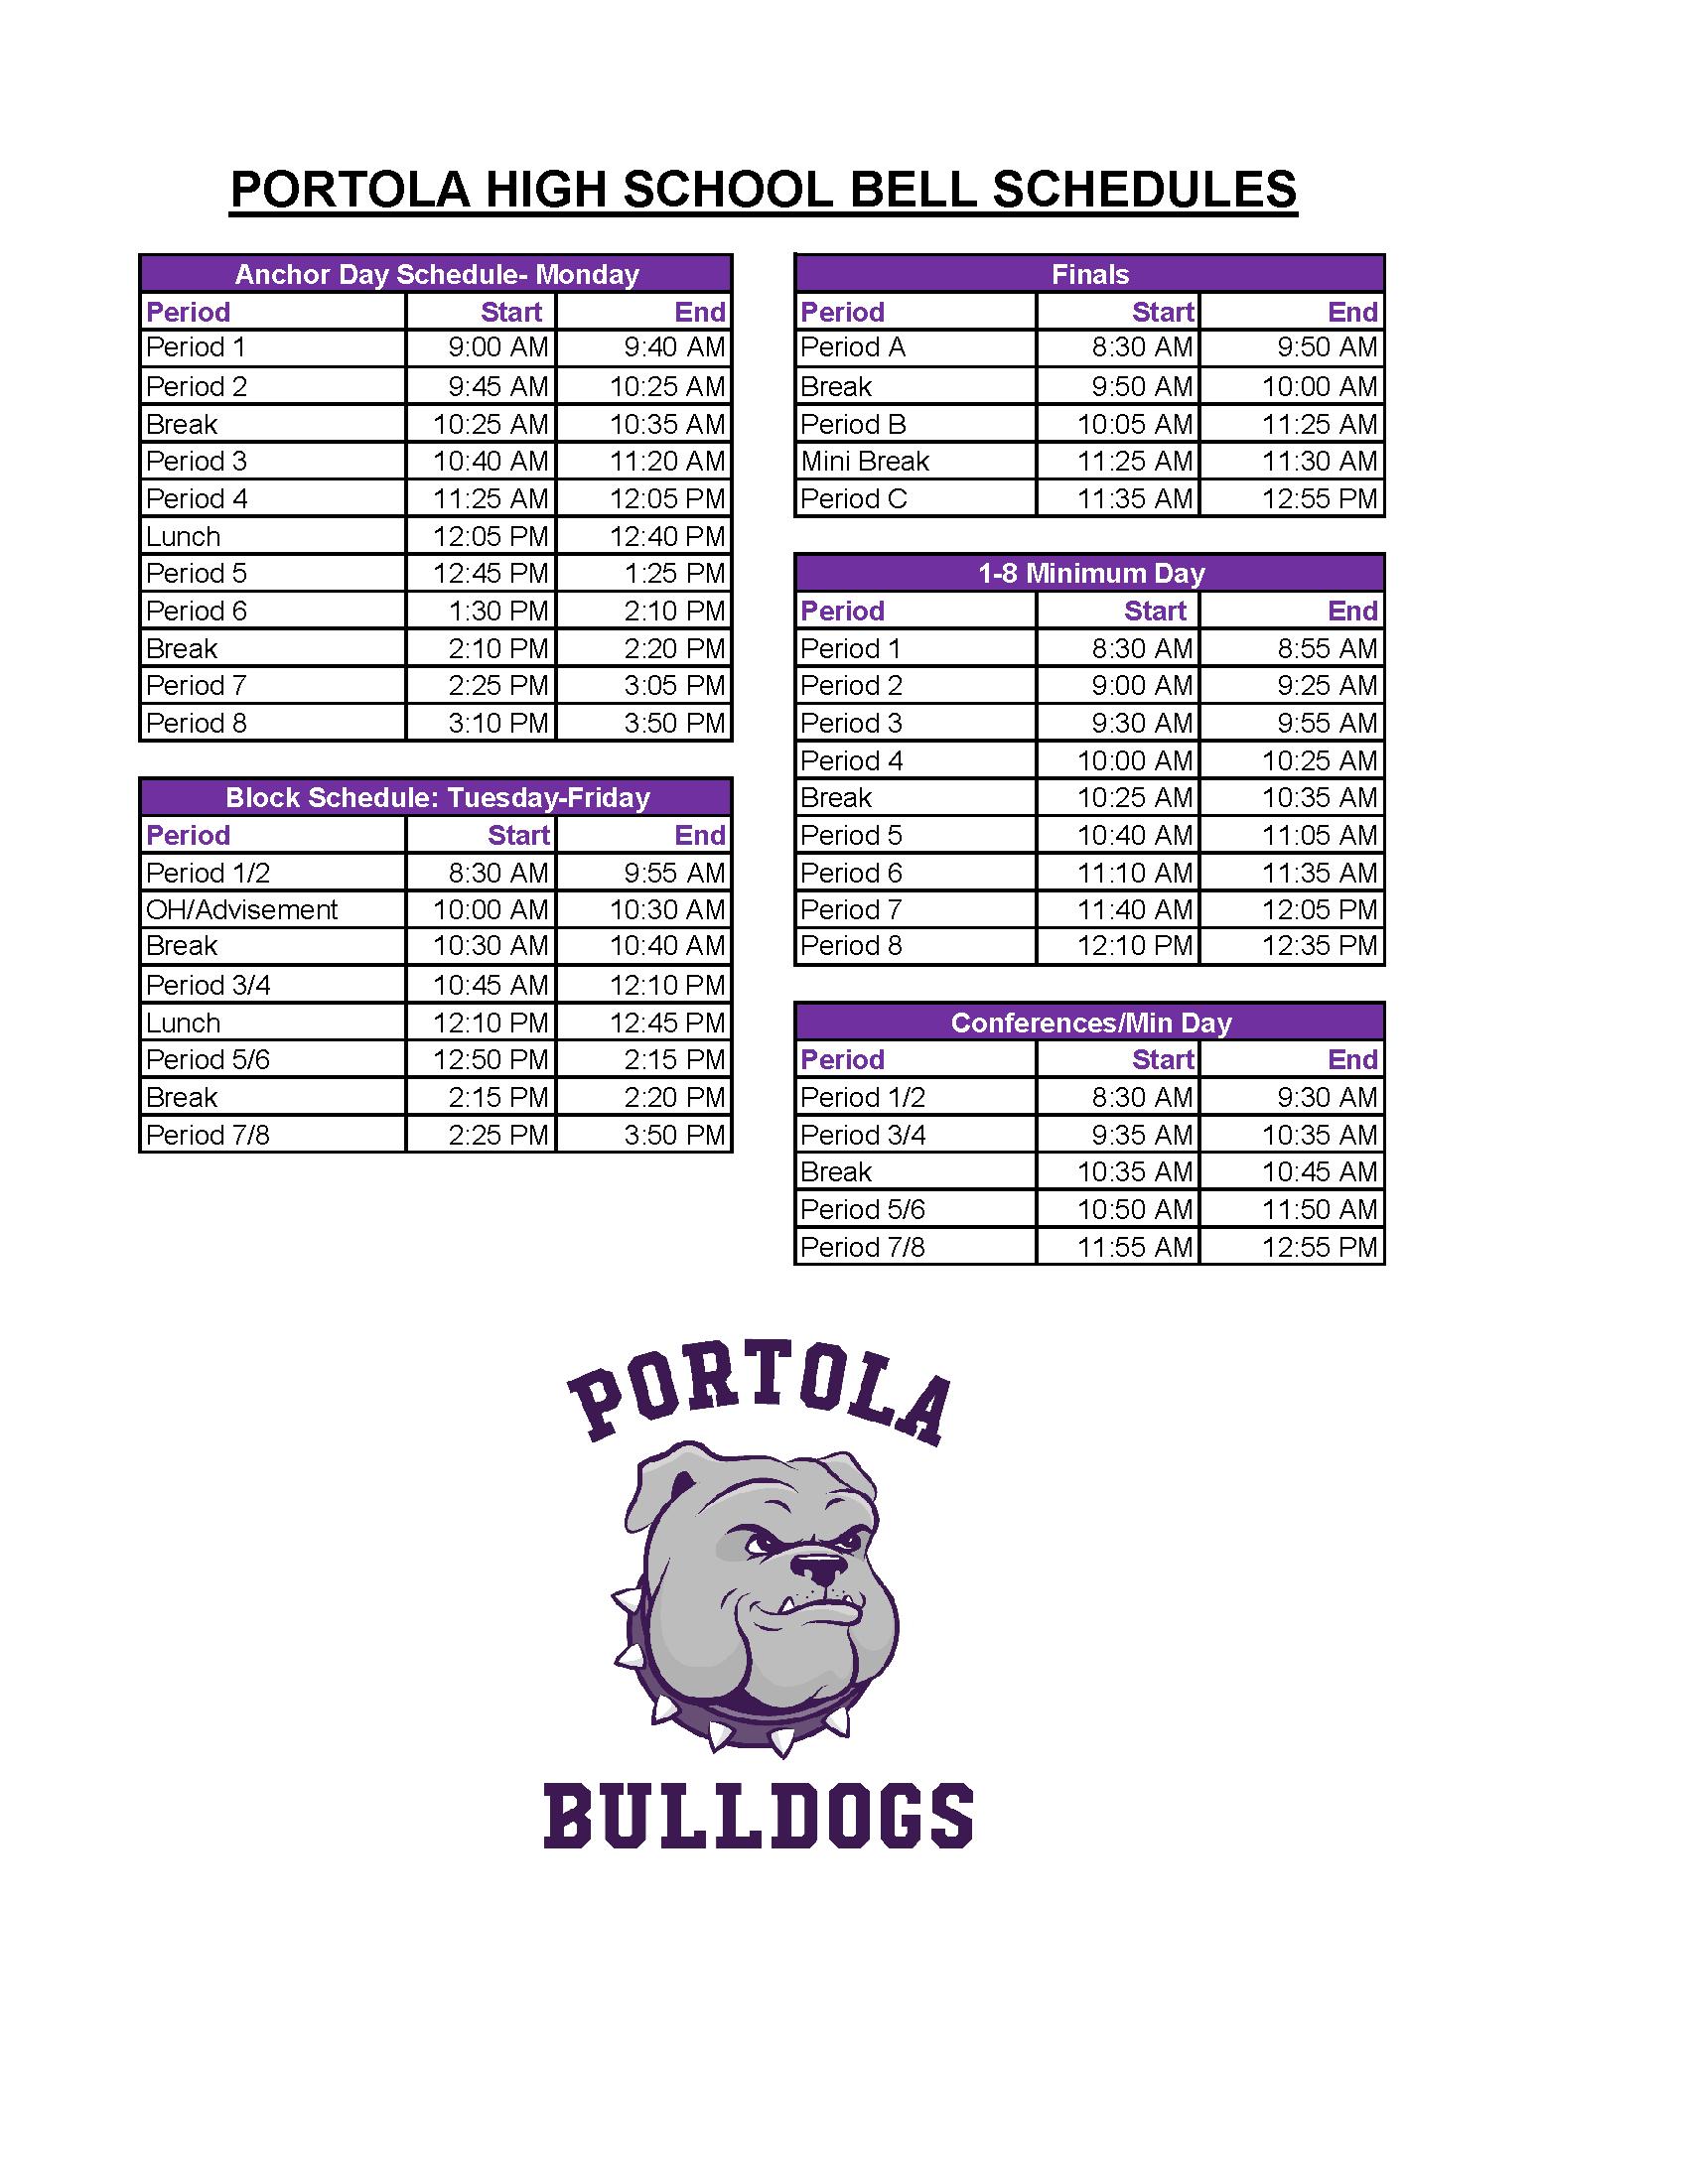 PHS Bell Schedule 2021-22